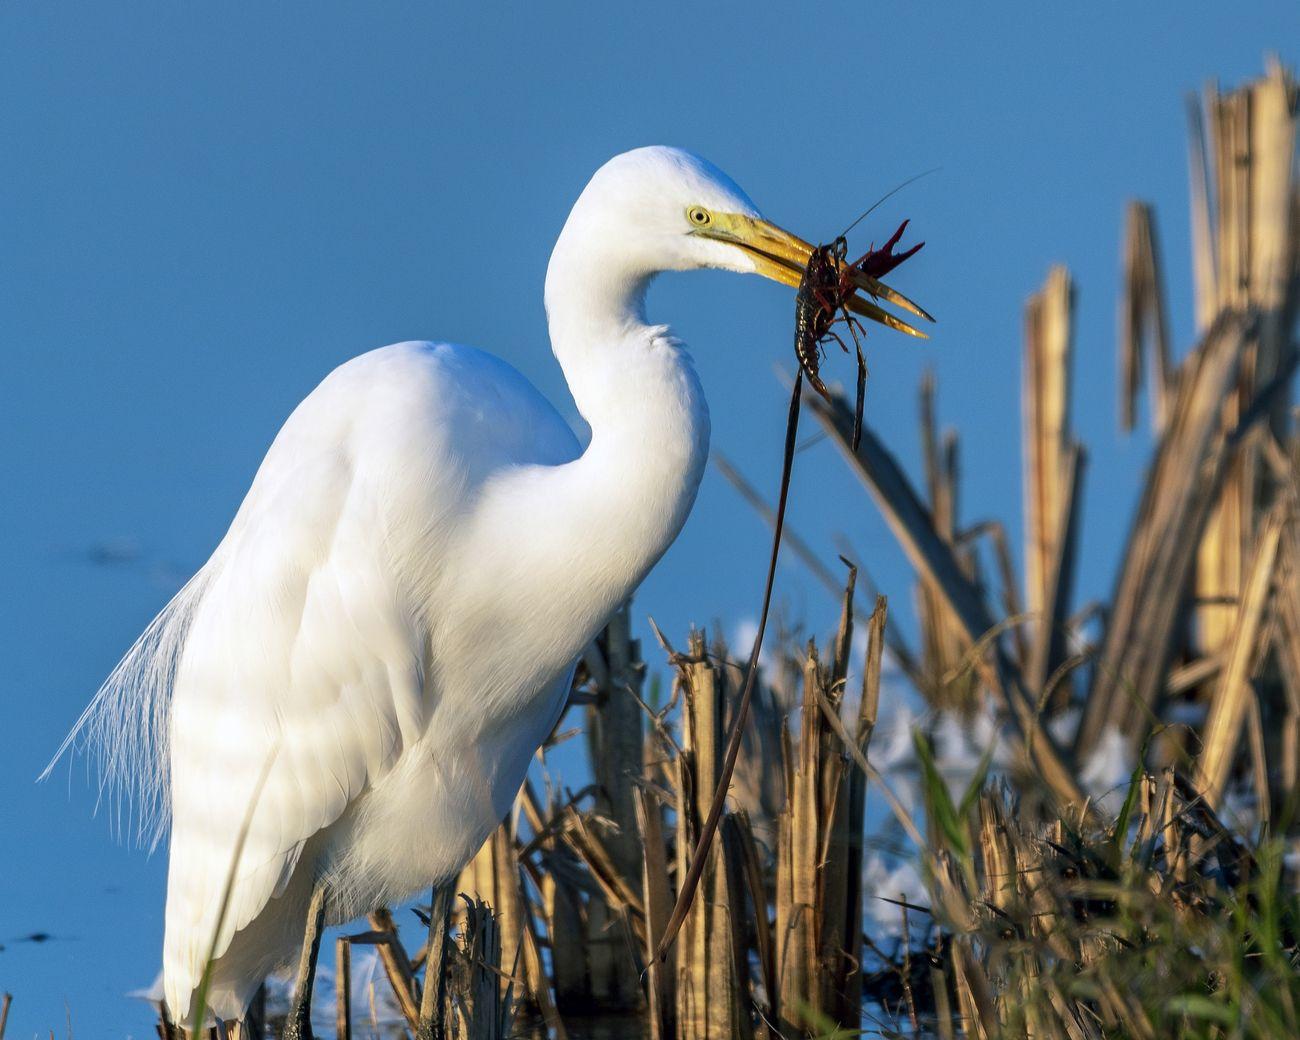 Great Egret feeding time at the Woodruff Silos in Yuba City California